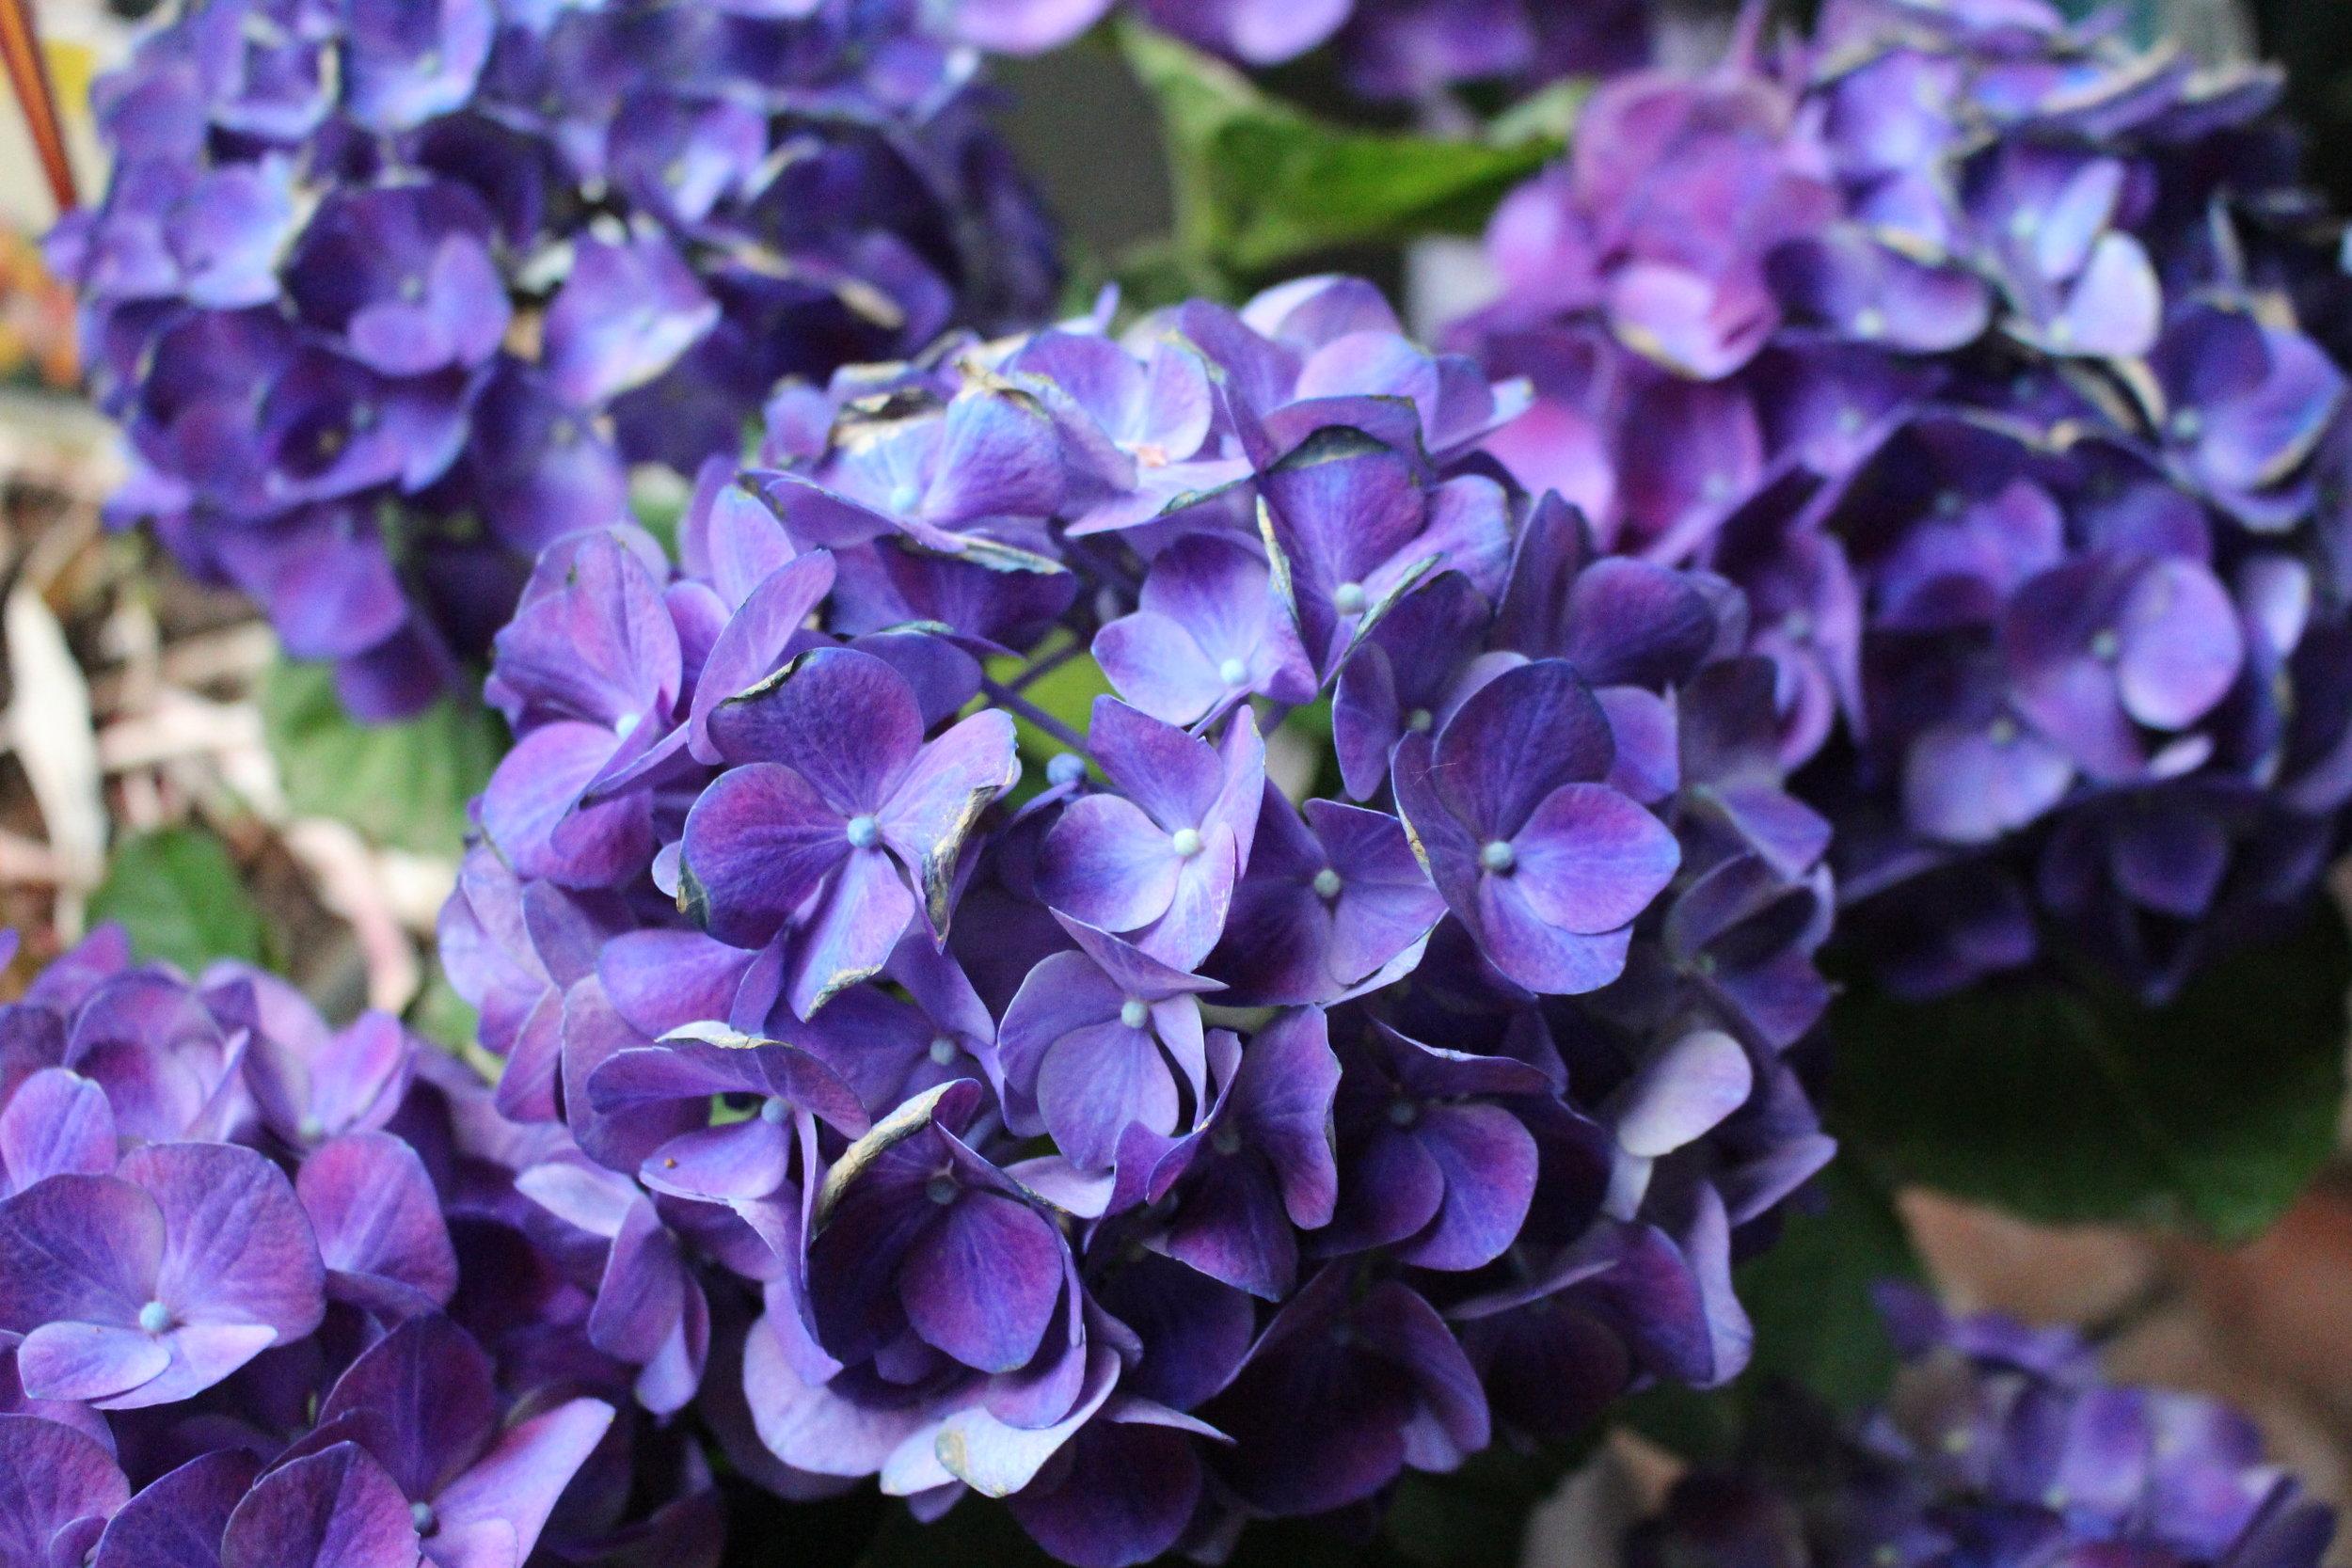 #138 Hydrangea, Hydrangea macrophylla